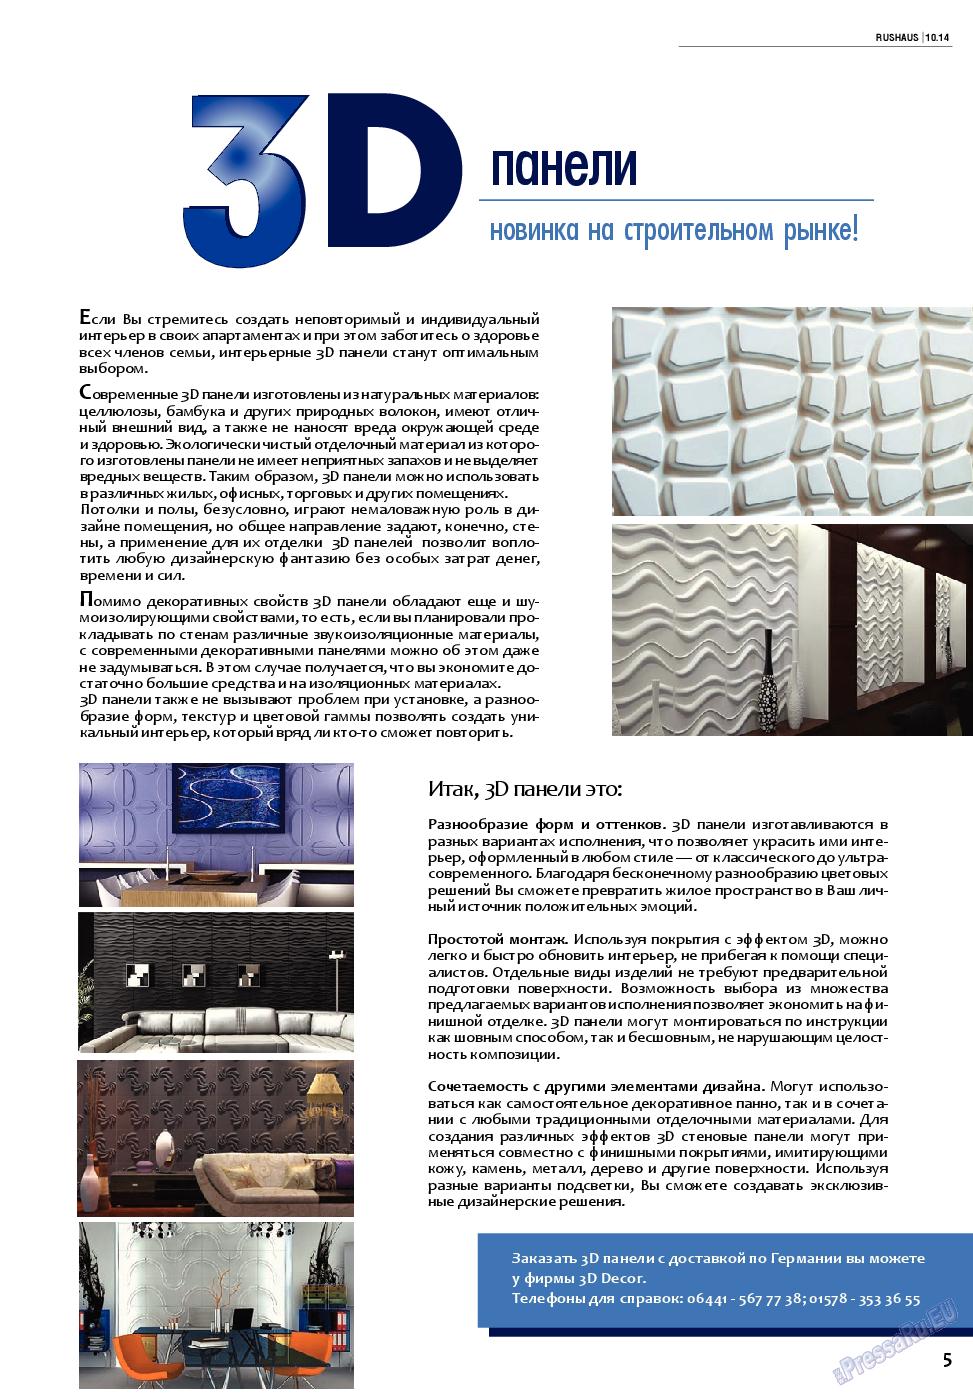 RusHaus (журнал). 2014 год, номер 2, стр. 5